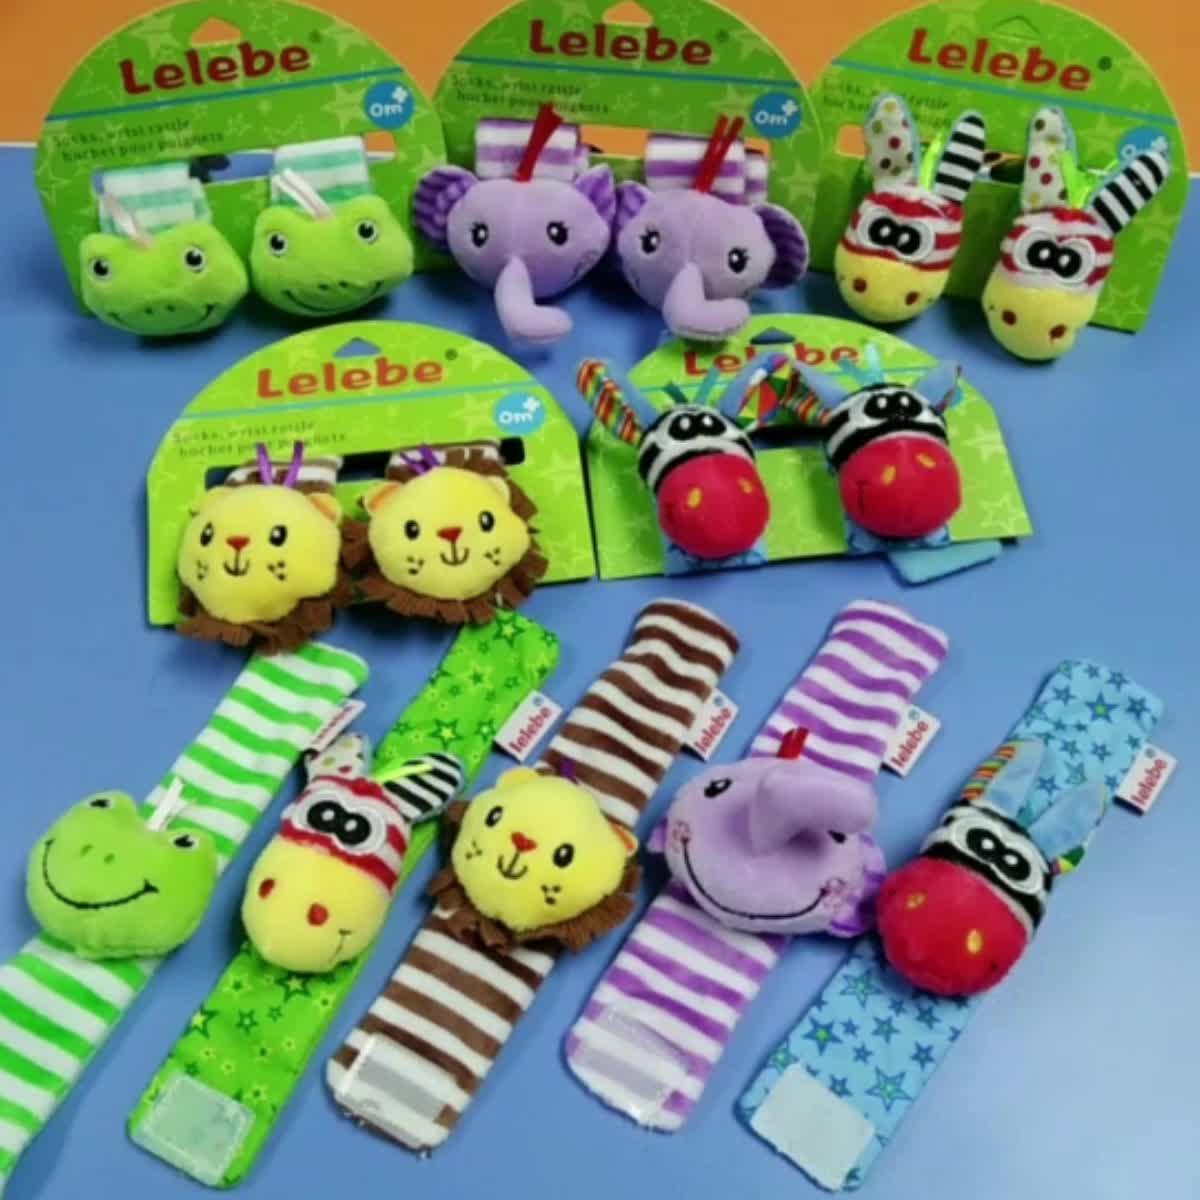 Baby Wrist Strap Hand Bell 2020 Oem Groothandel Baby Hand Bell Pluche Soft Animal Wrist Band Andere Speelgoed Baby Rammelaars